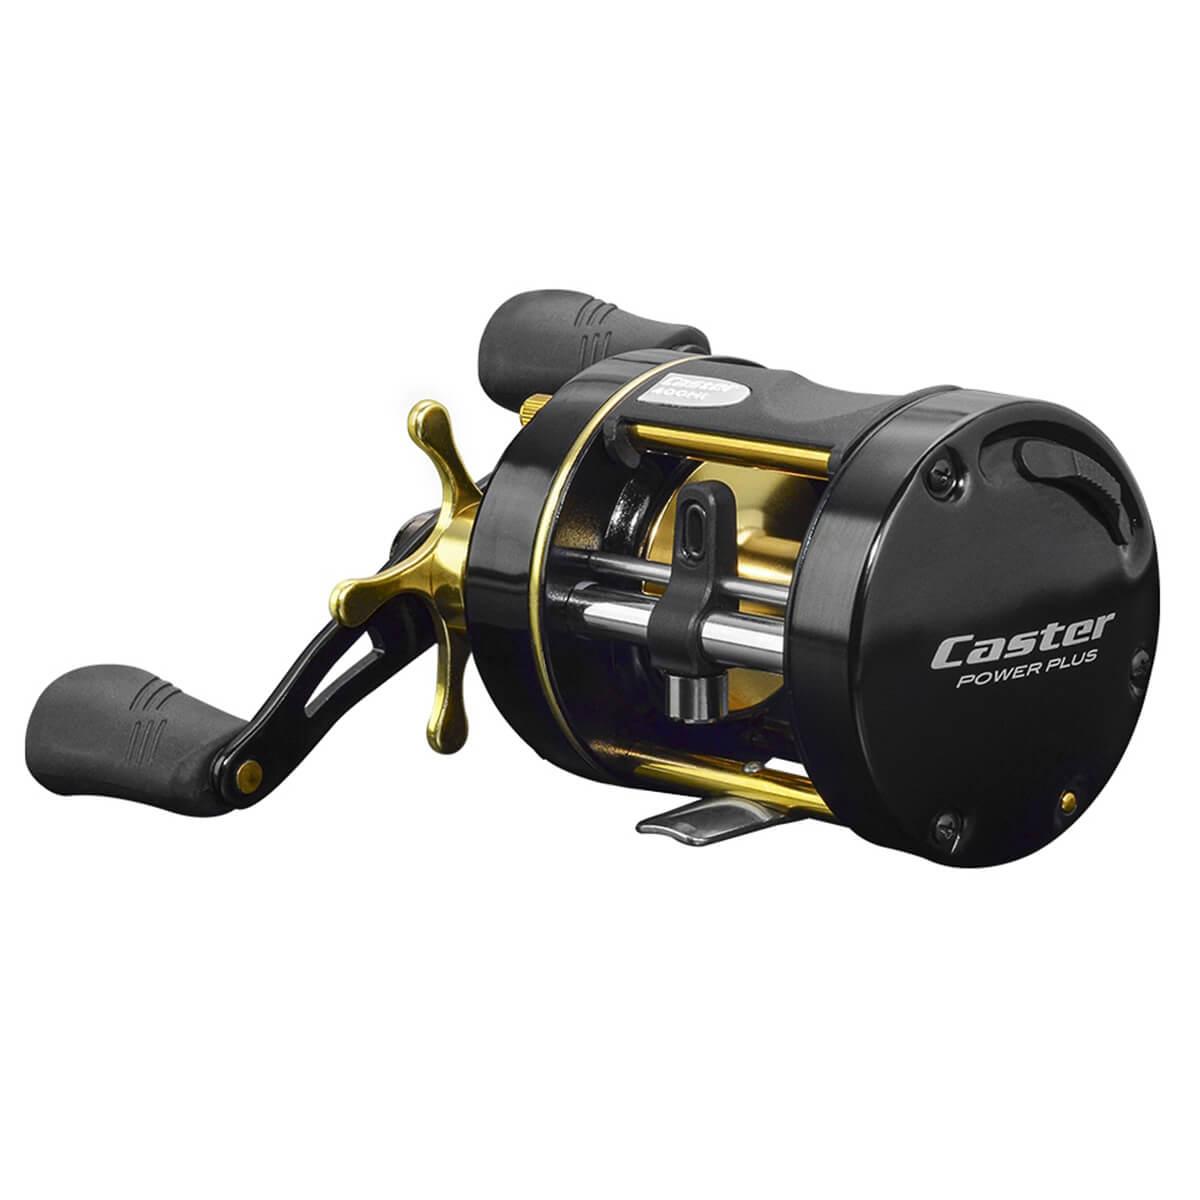 Carretilha Marine Sports Caster Power Plus 400 5.3:1